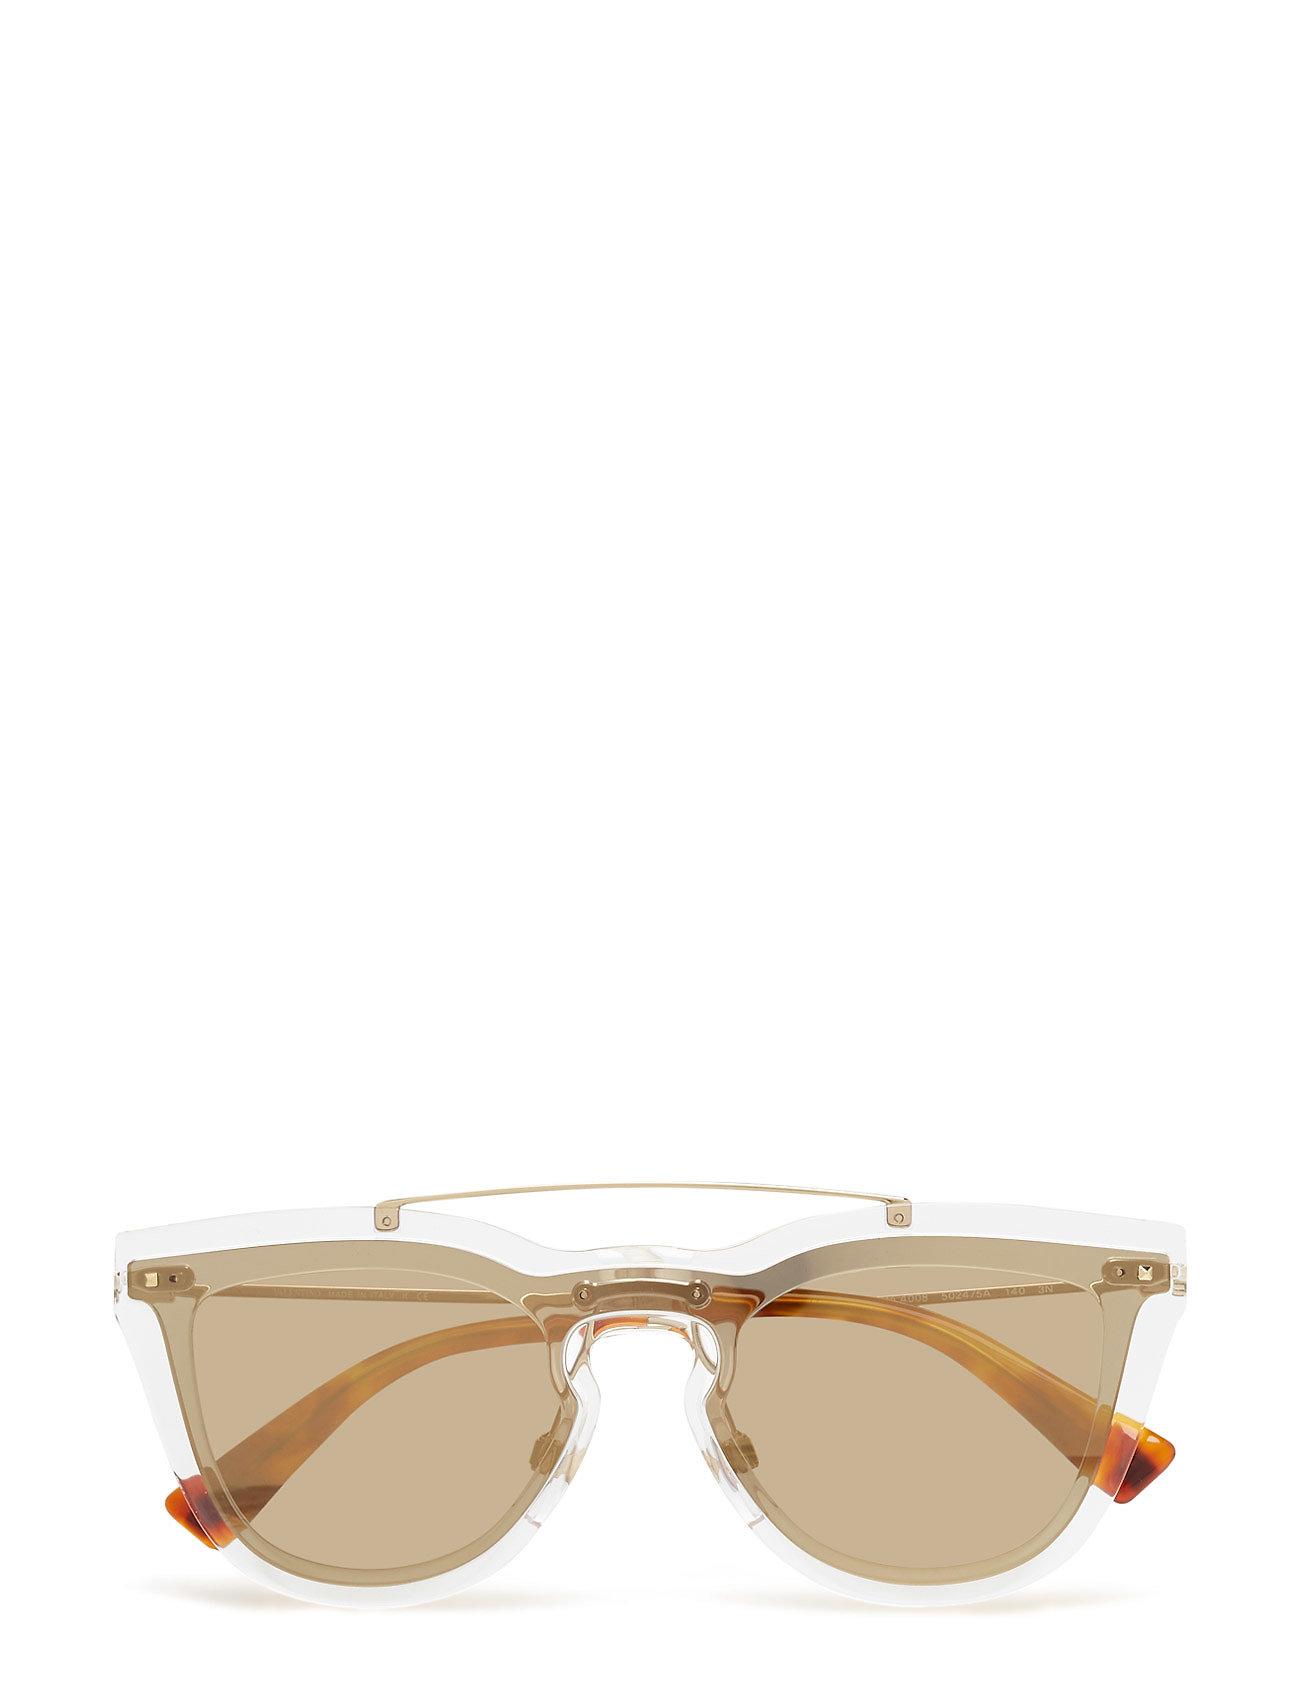 Glamgloss - Valentino Sunglasses